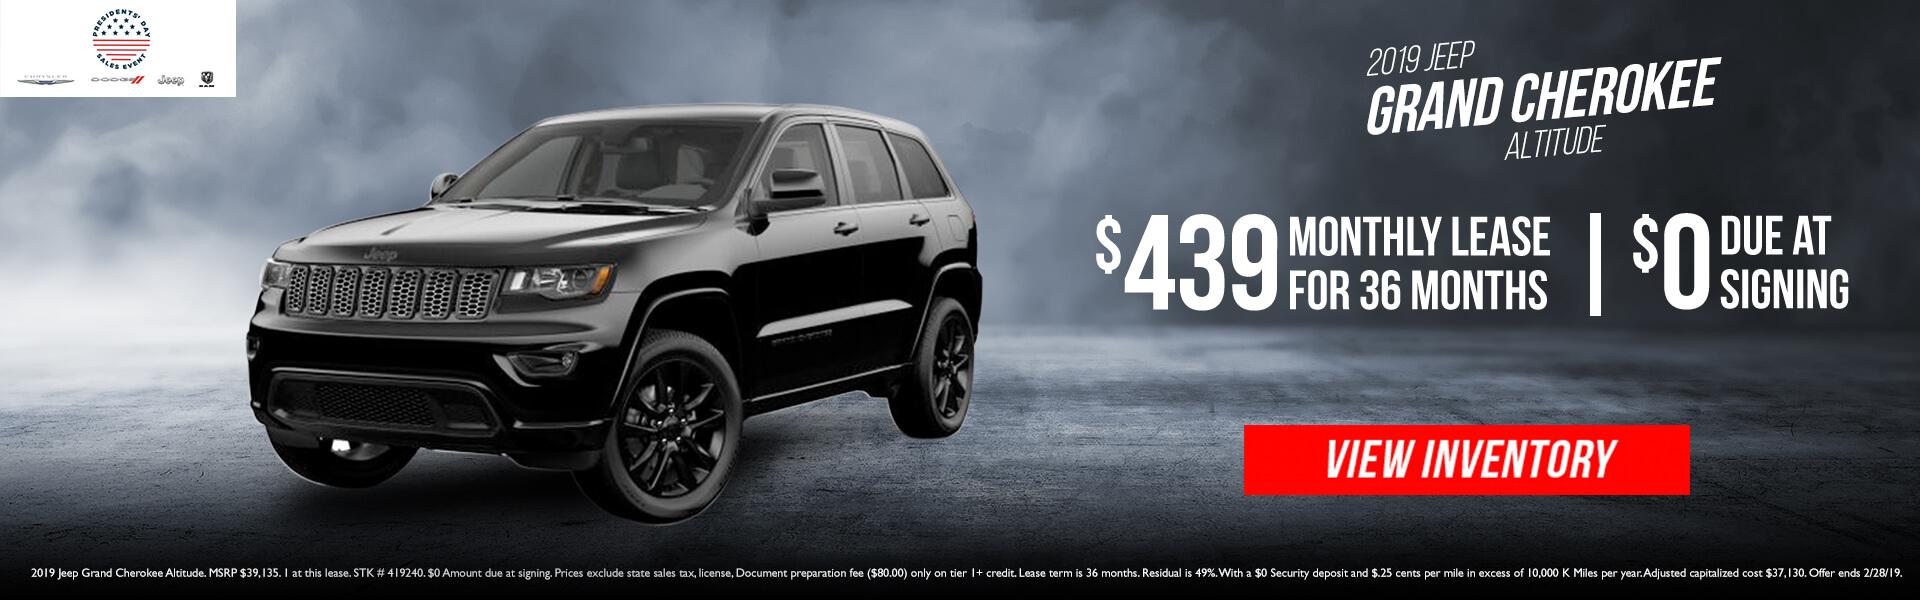 2019 Jeep Grand Cherokee 419240